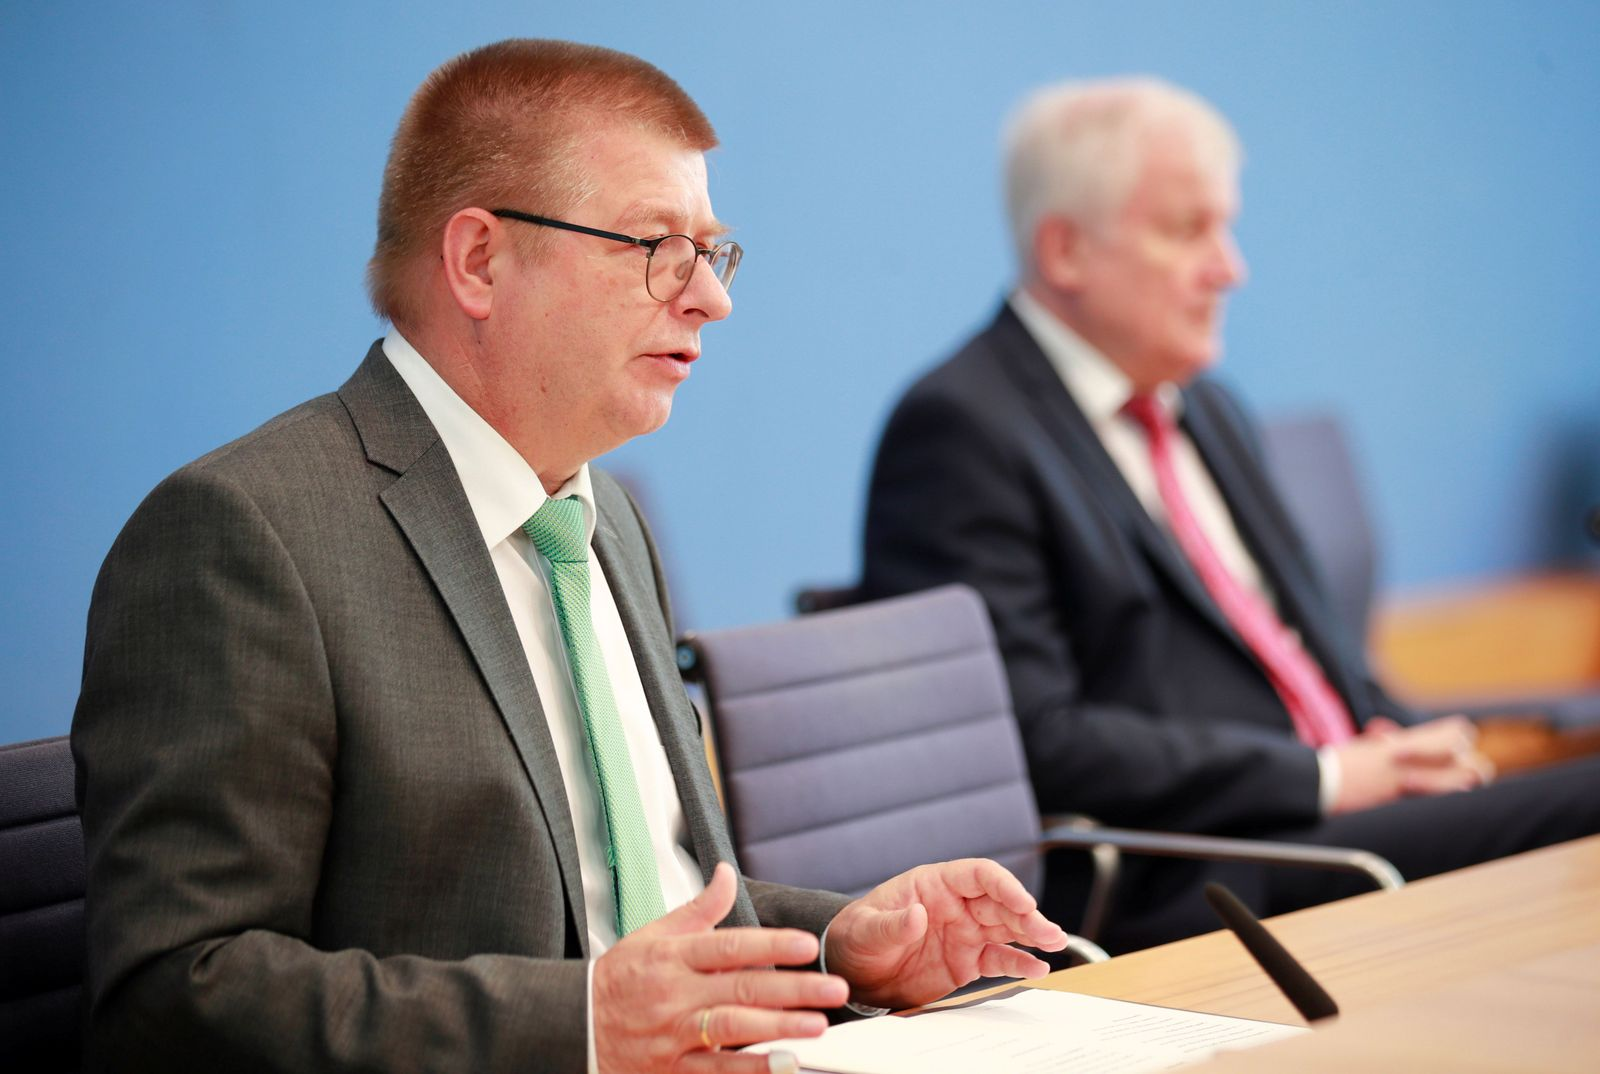 GERMANY-POLITICS-GOVERNMENT-HEALTH-VIRUS